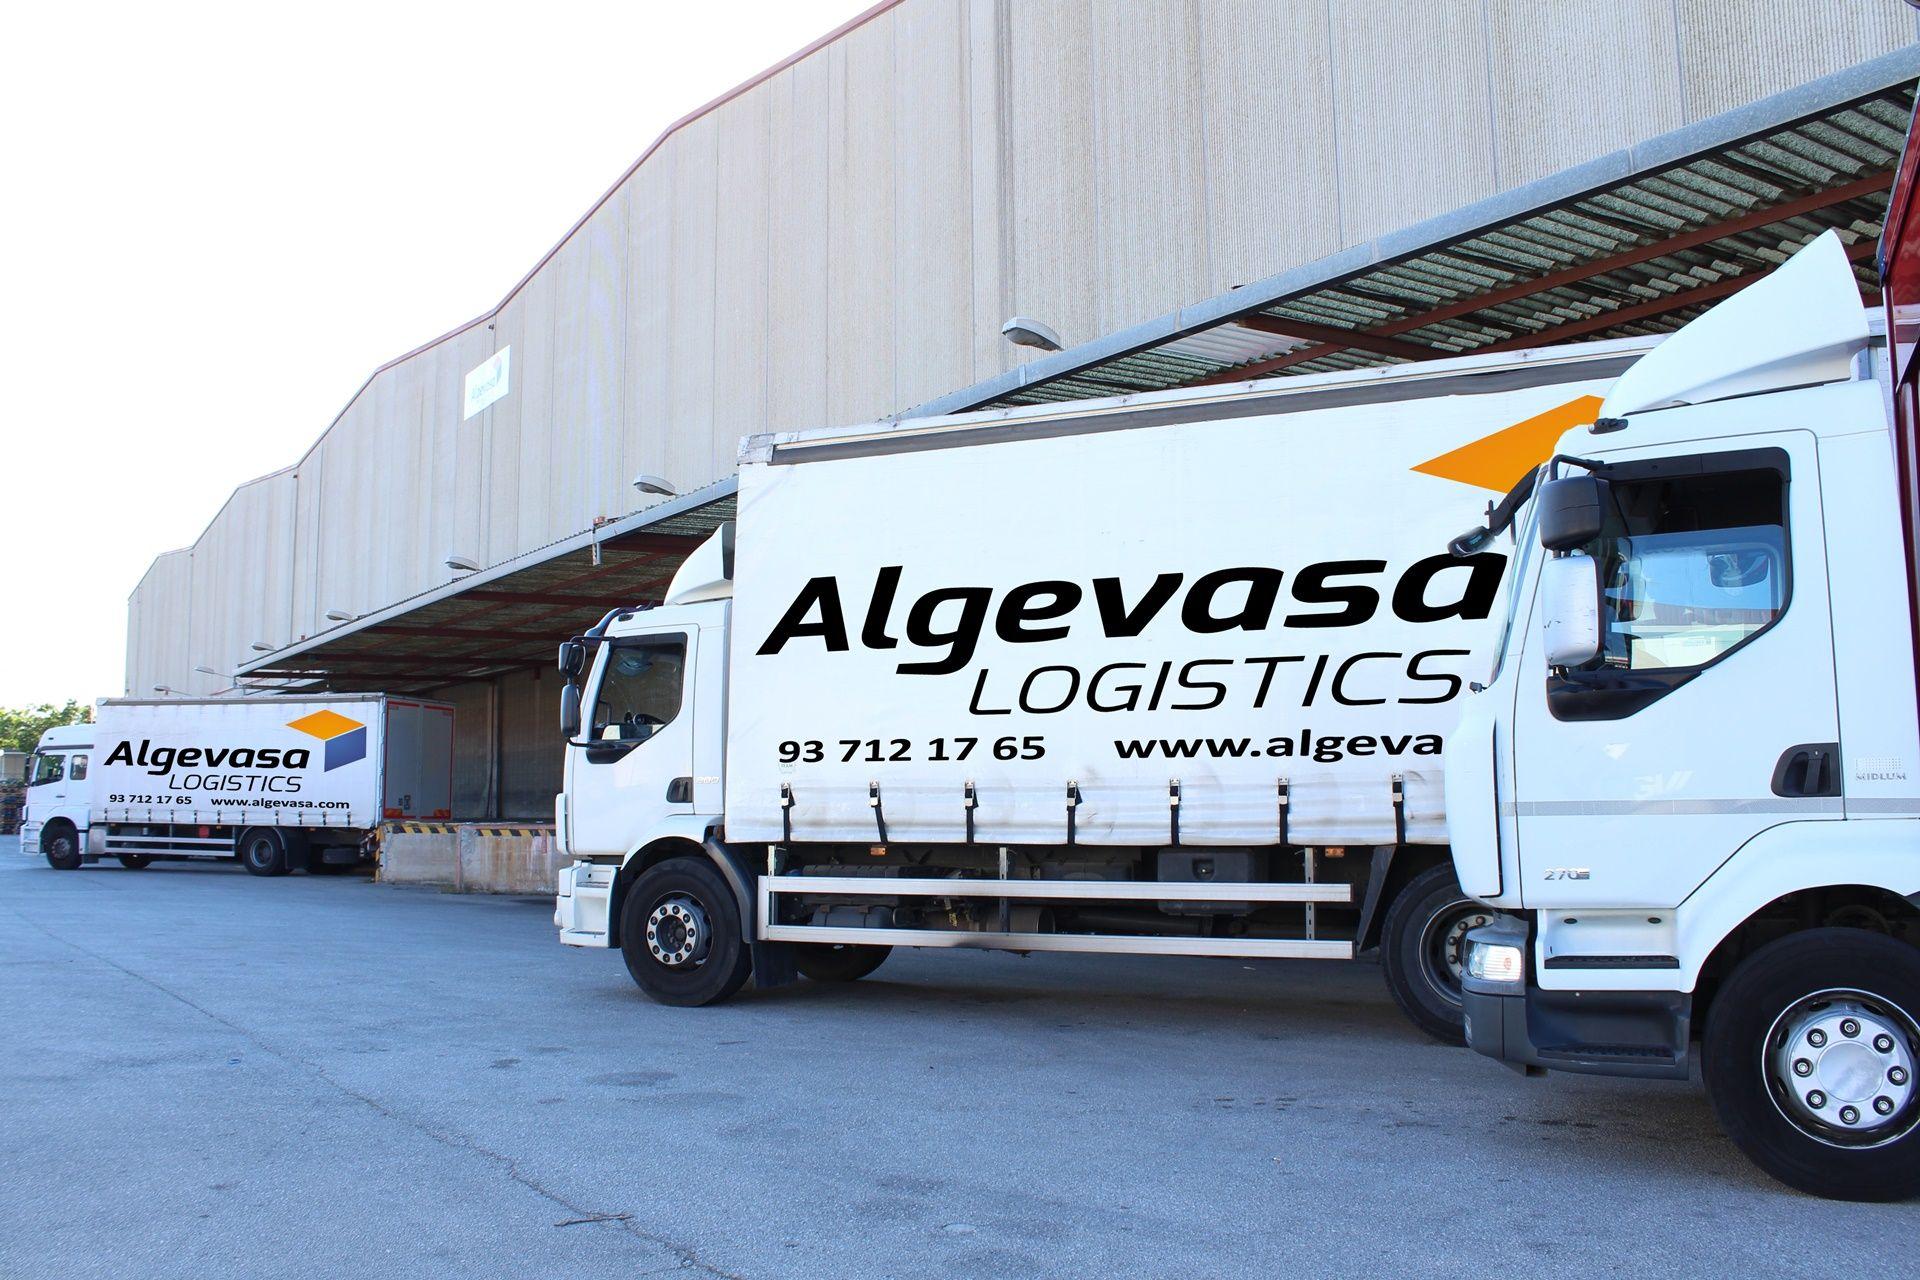 Algevasa Logistics se suma como miembro a Palletways Iberia